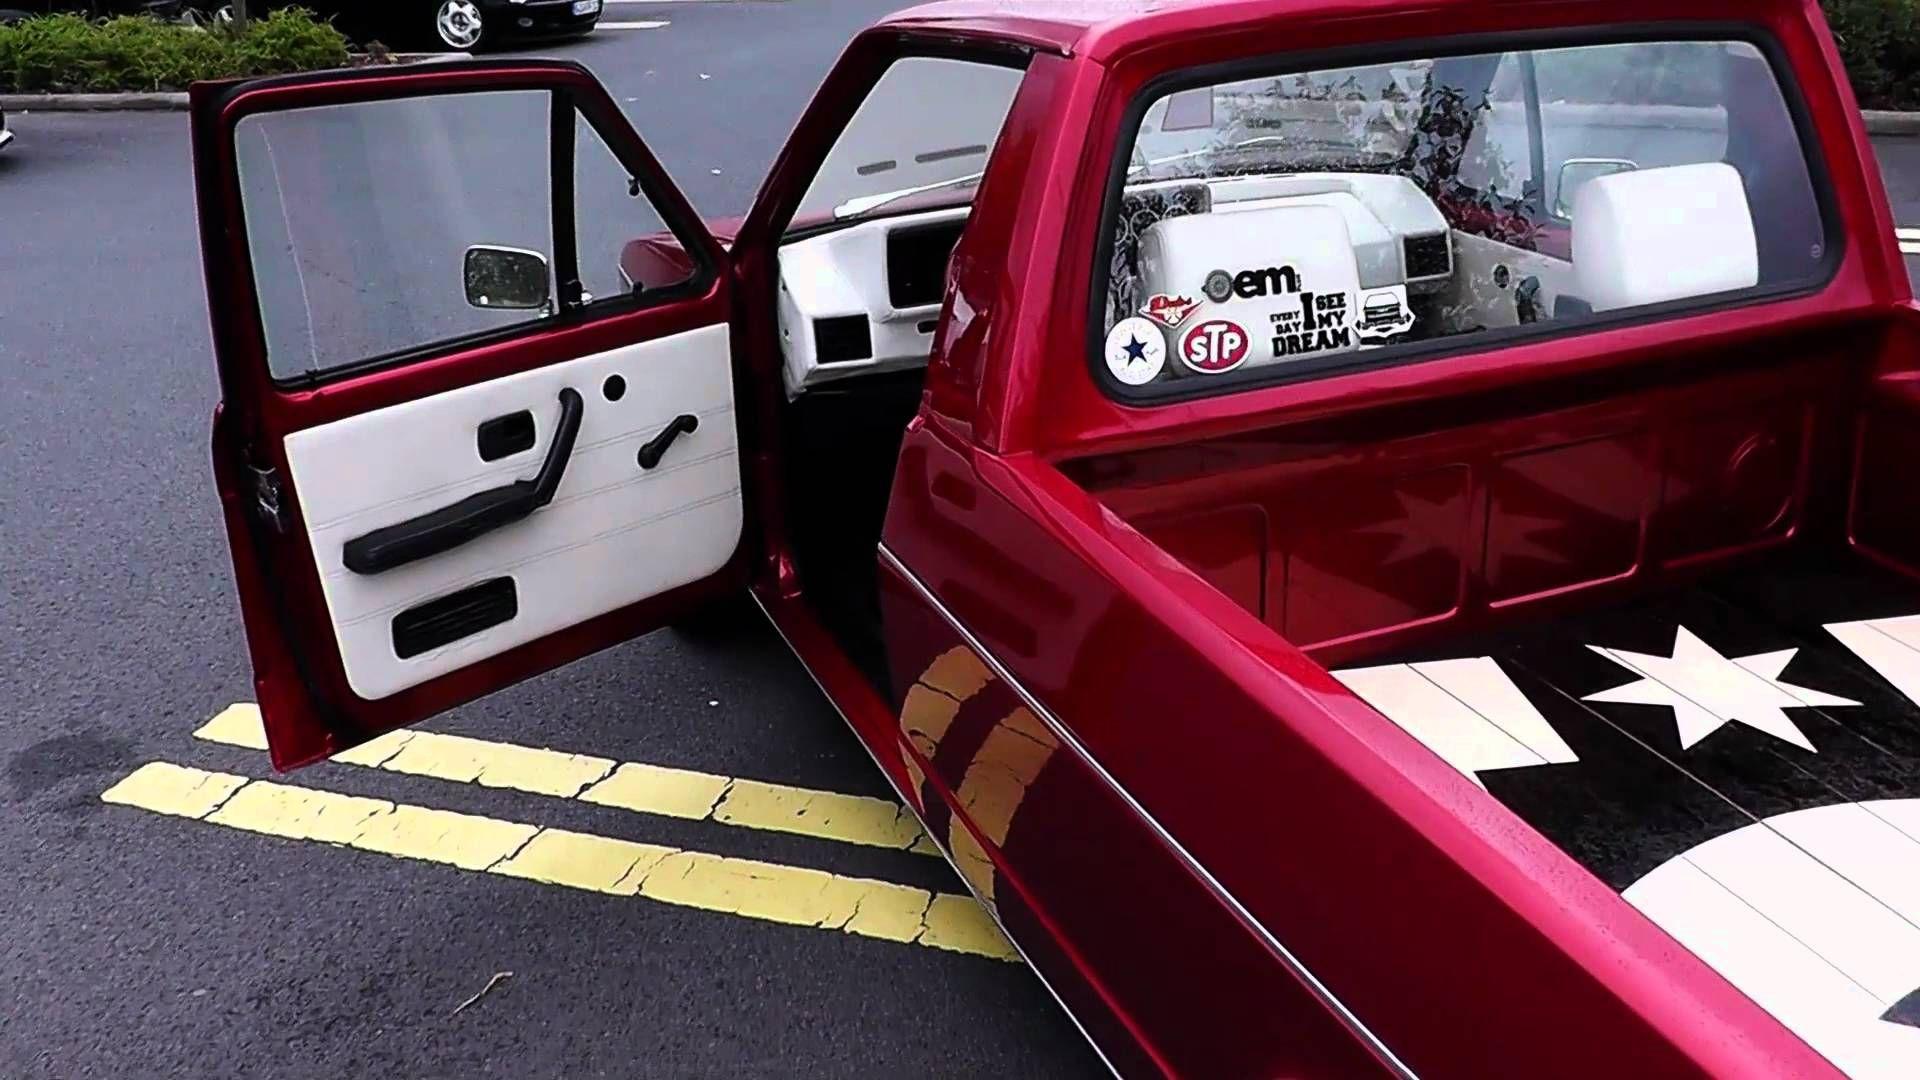 VW Caddy Mk1  bagged Golf Mk4  Slammed VWs  Pinterest  Mk1